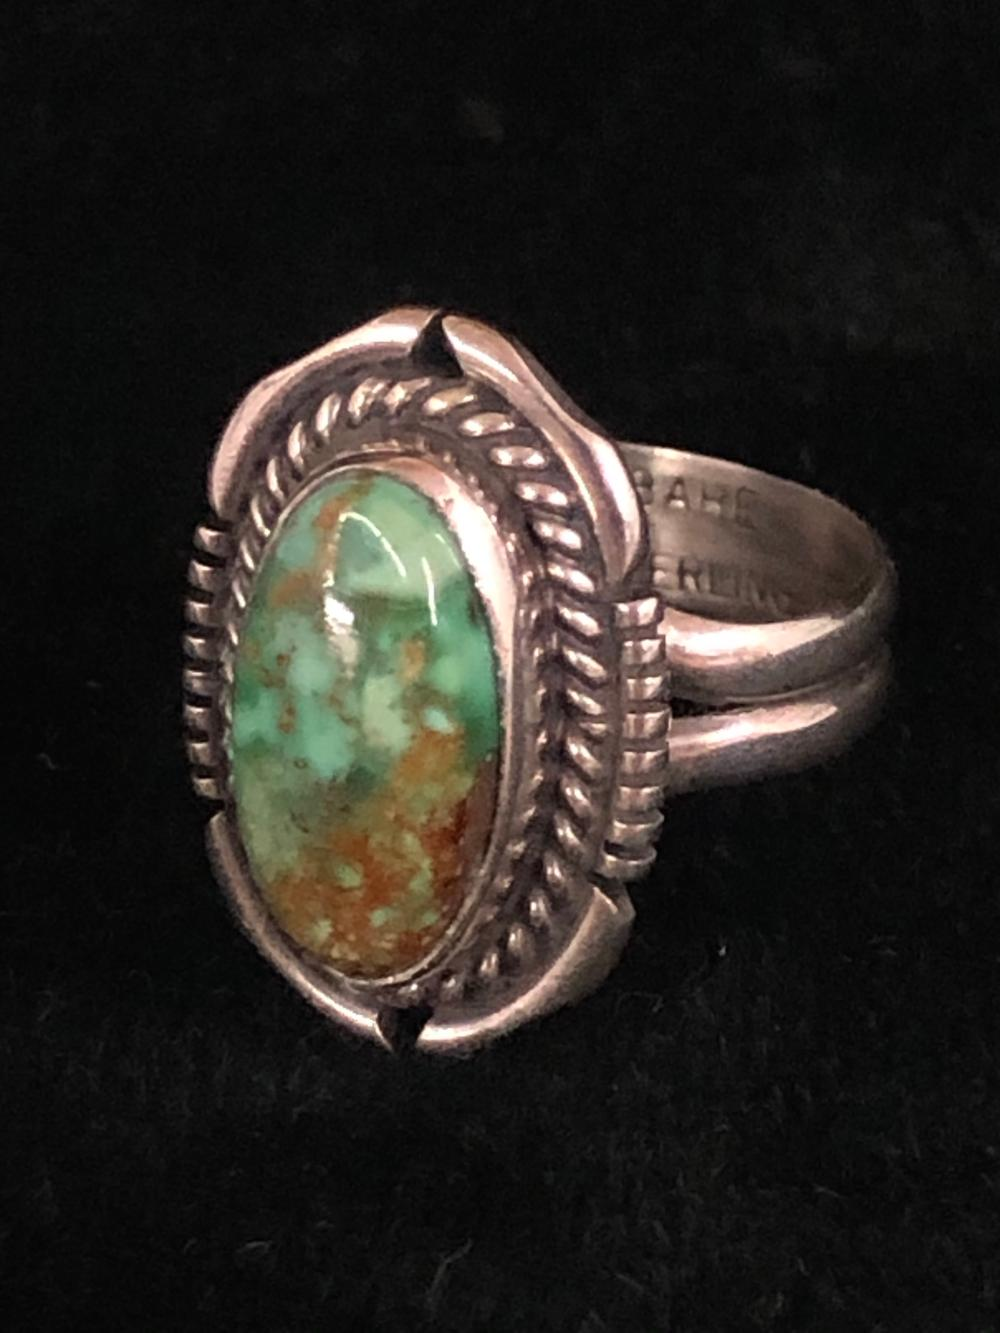 Kingman turquoise sterling silver ring